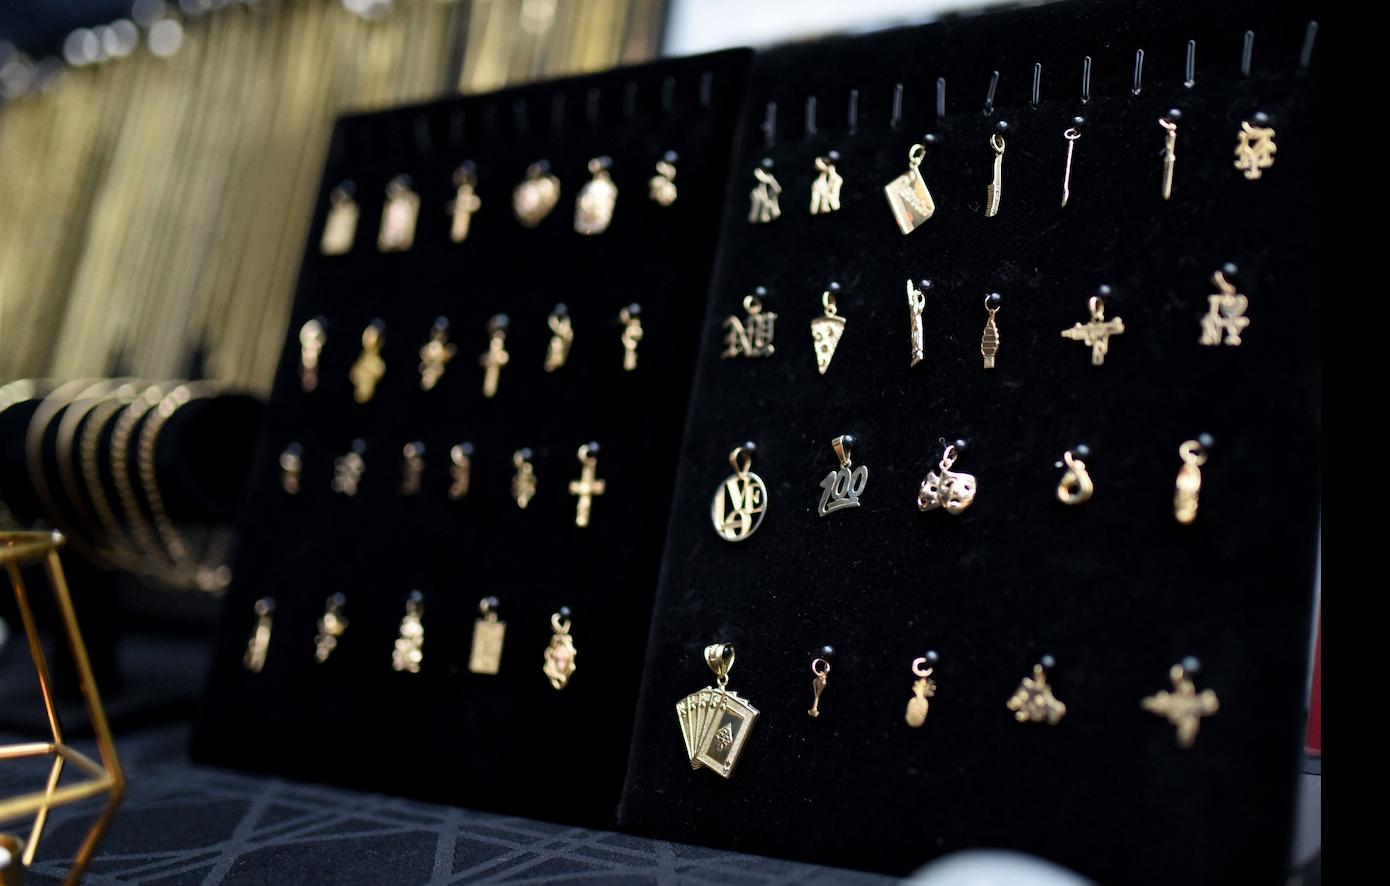 Believer Jewelryポップアップ、MAGIC STICKで開催 STUDIO33による刺繍ワークショップも